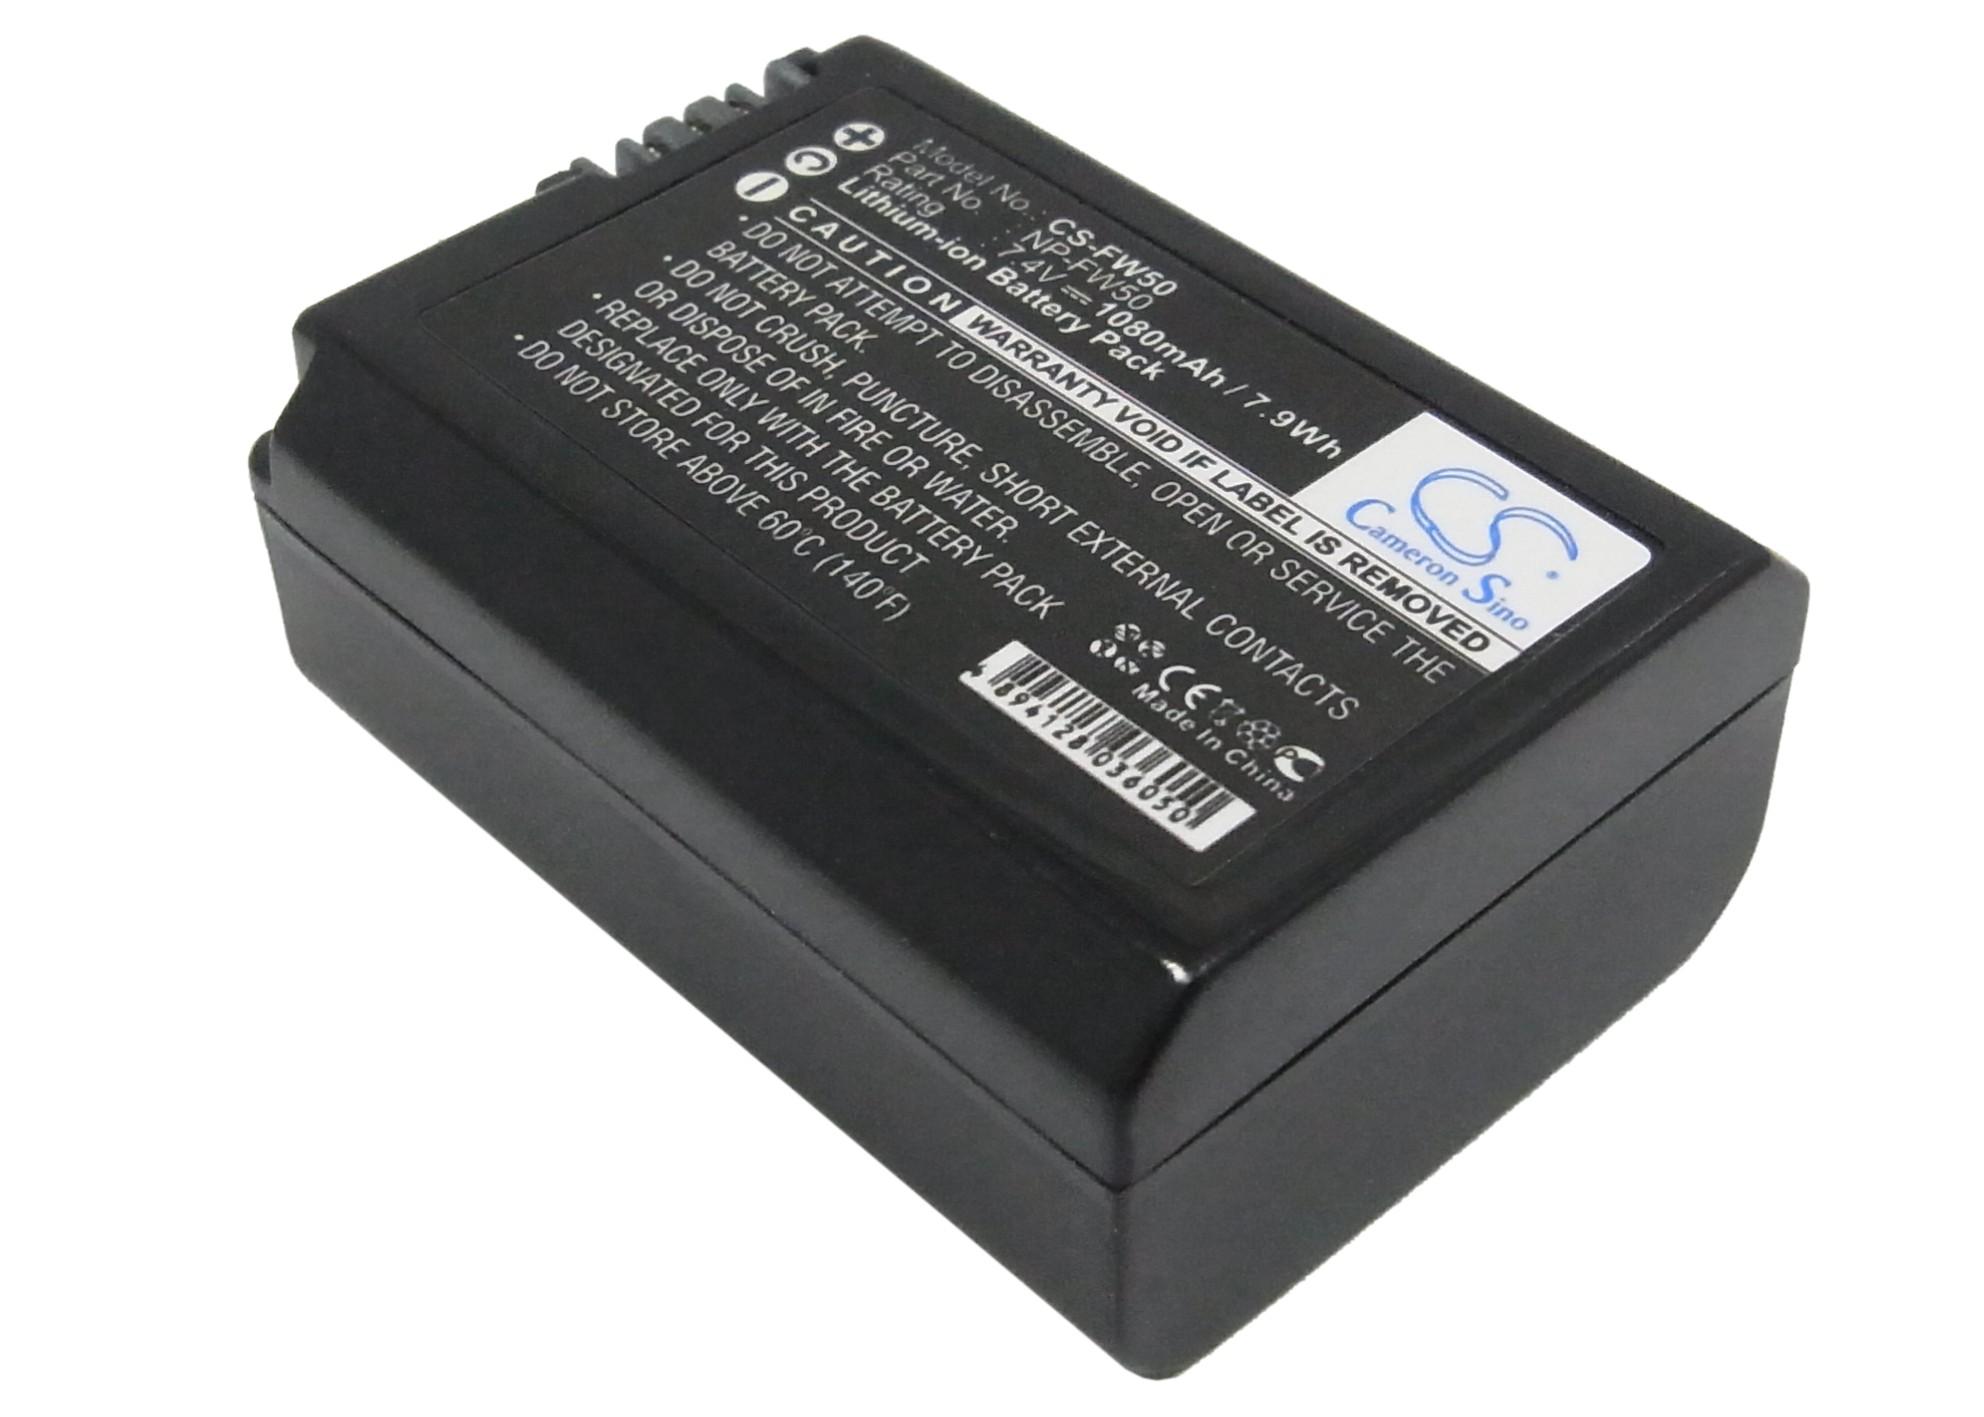 Cameron Sino baterie do kamer a fotoaparátů pro SONY Mirrorless Alpha A3000 7.4V Li-ion 1080mAh černá - neoriginální